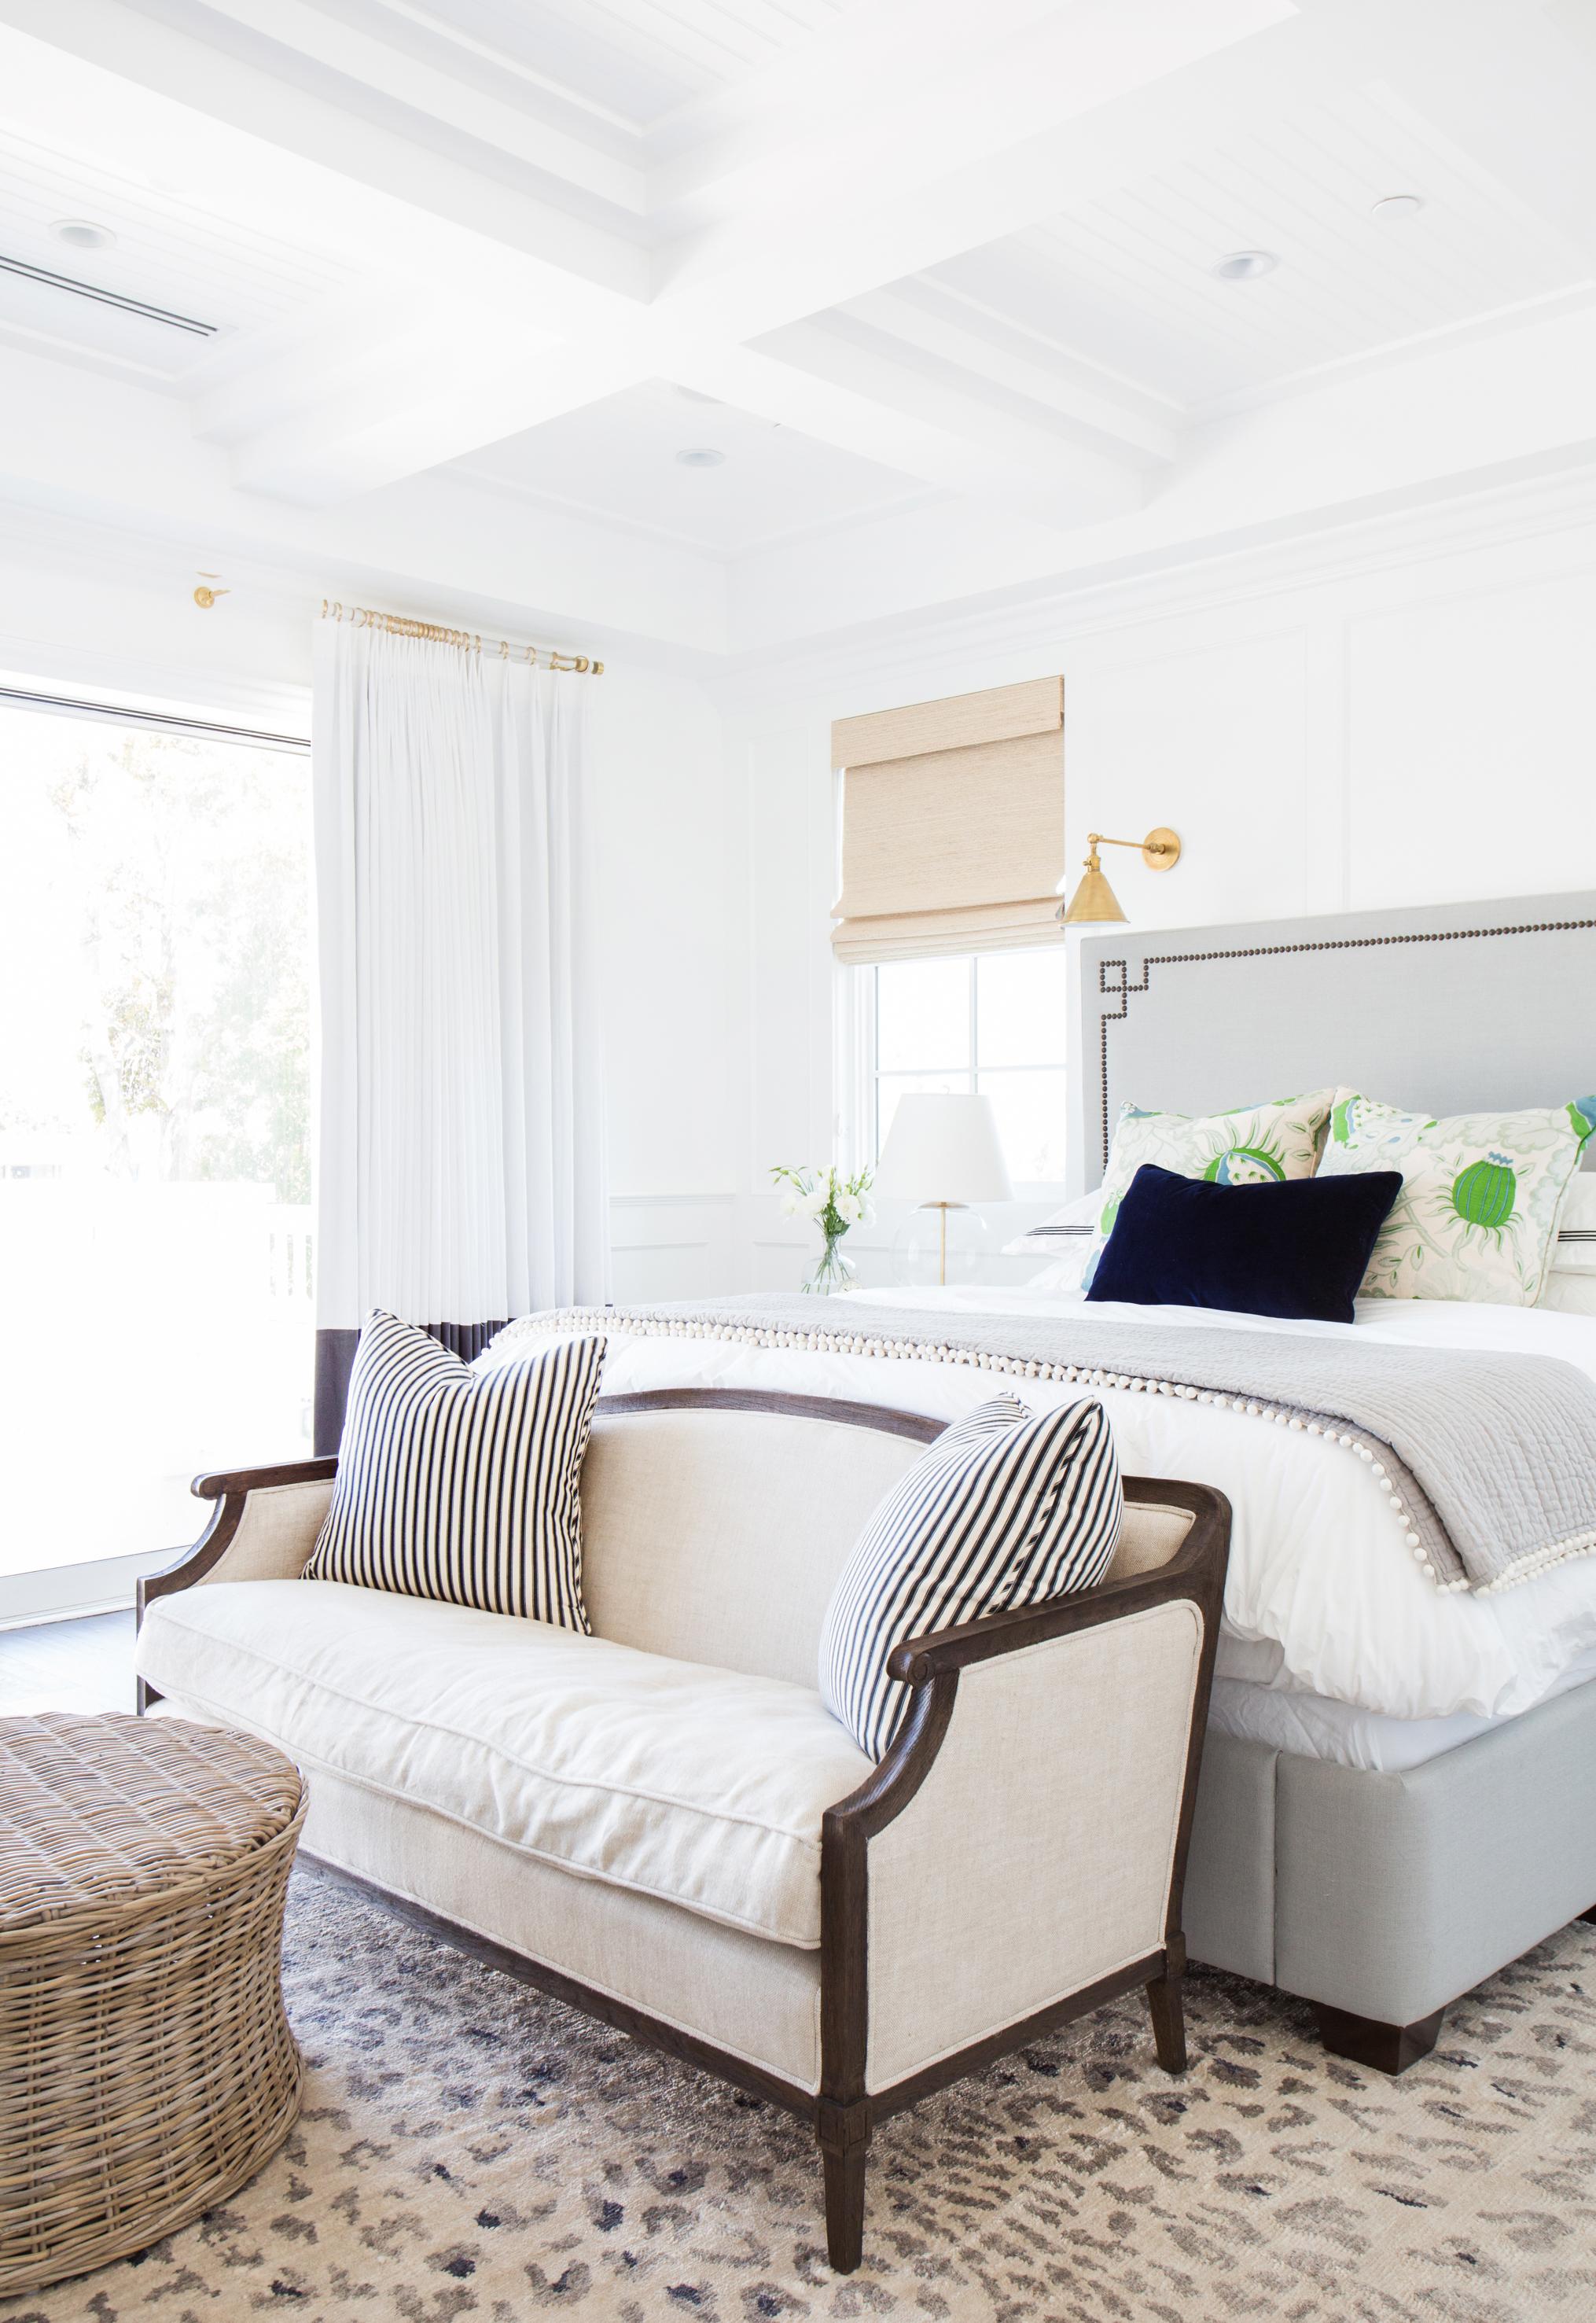 Studio McGee - Pacific Palisades Bedroom